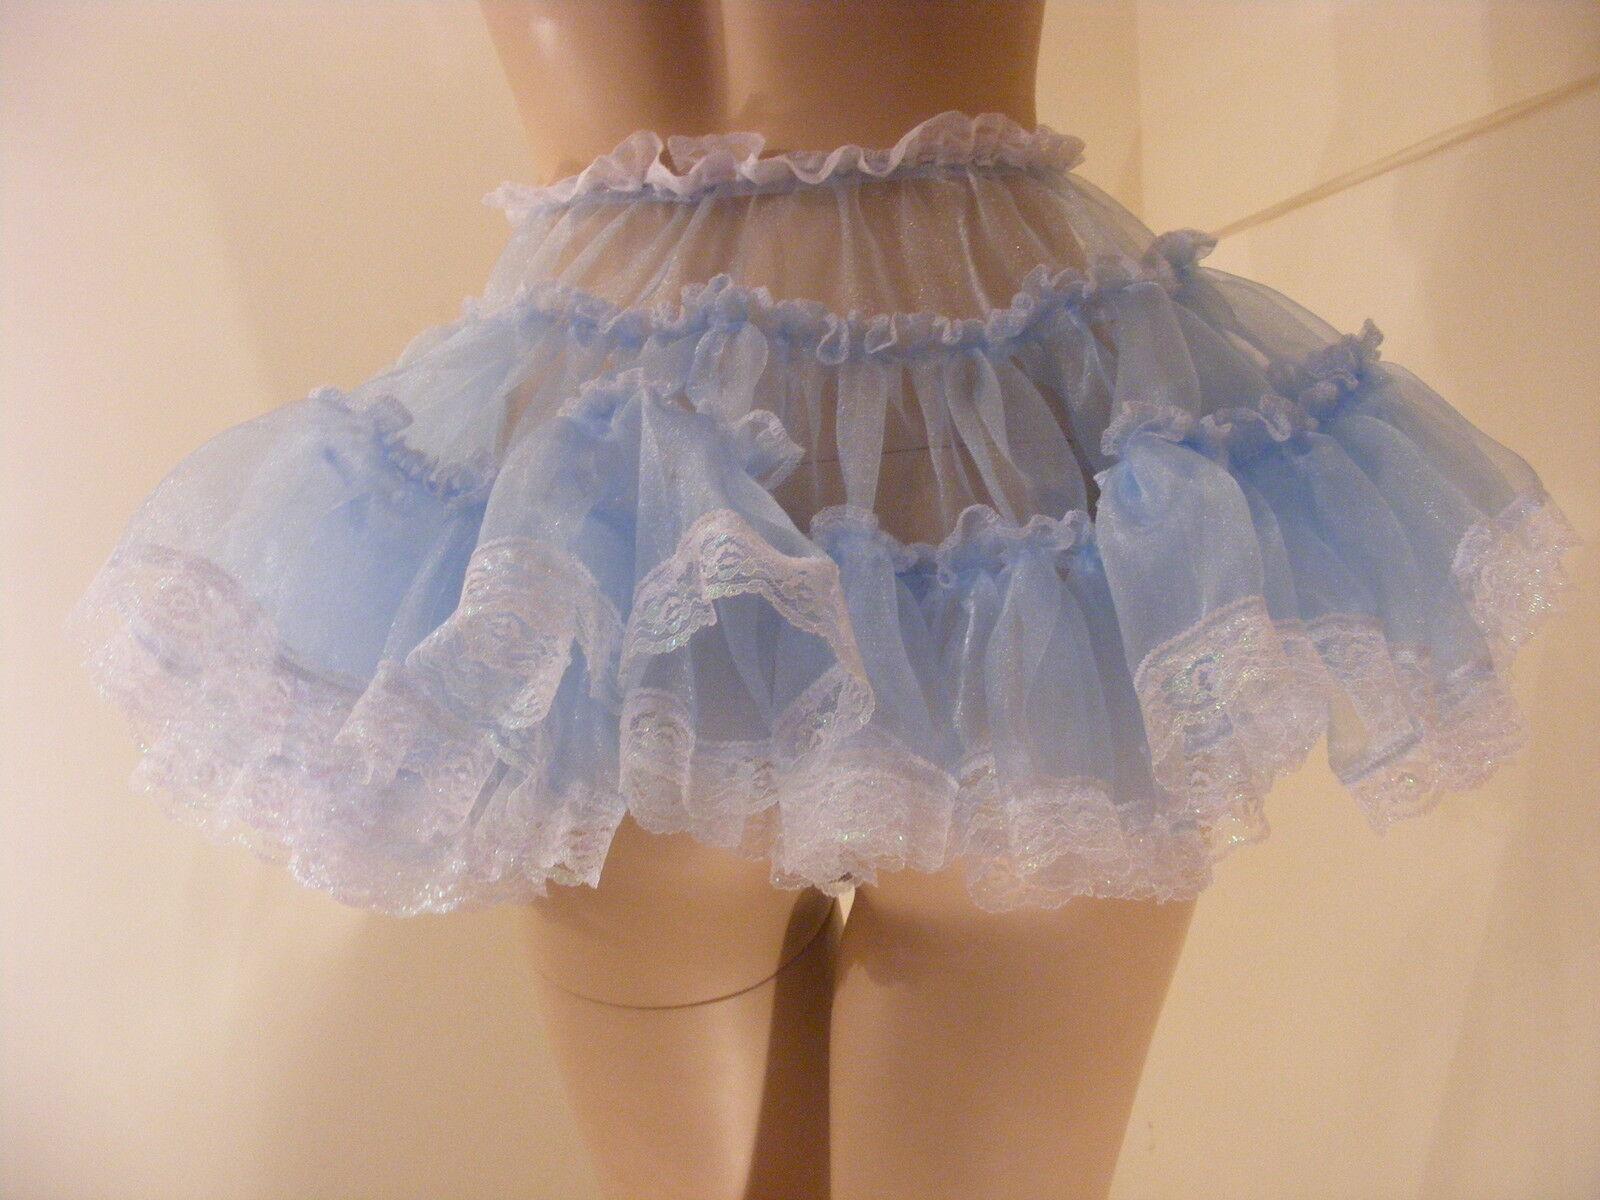 SISSY ADULT BABY FANCY DRESS blueE ORGANZA MICRO MINI SKIRT 11 LONG COSPLAY